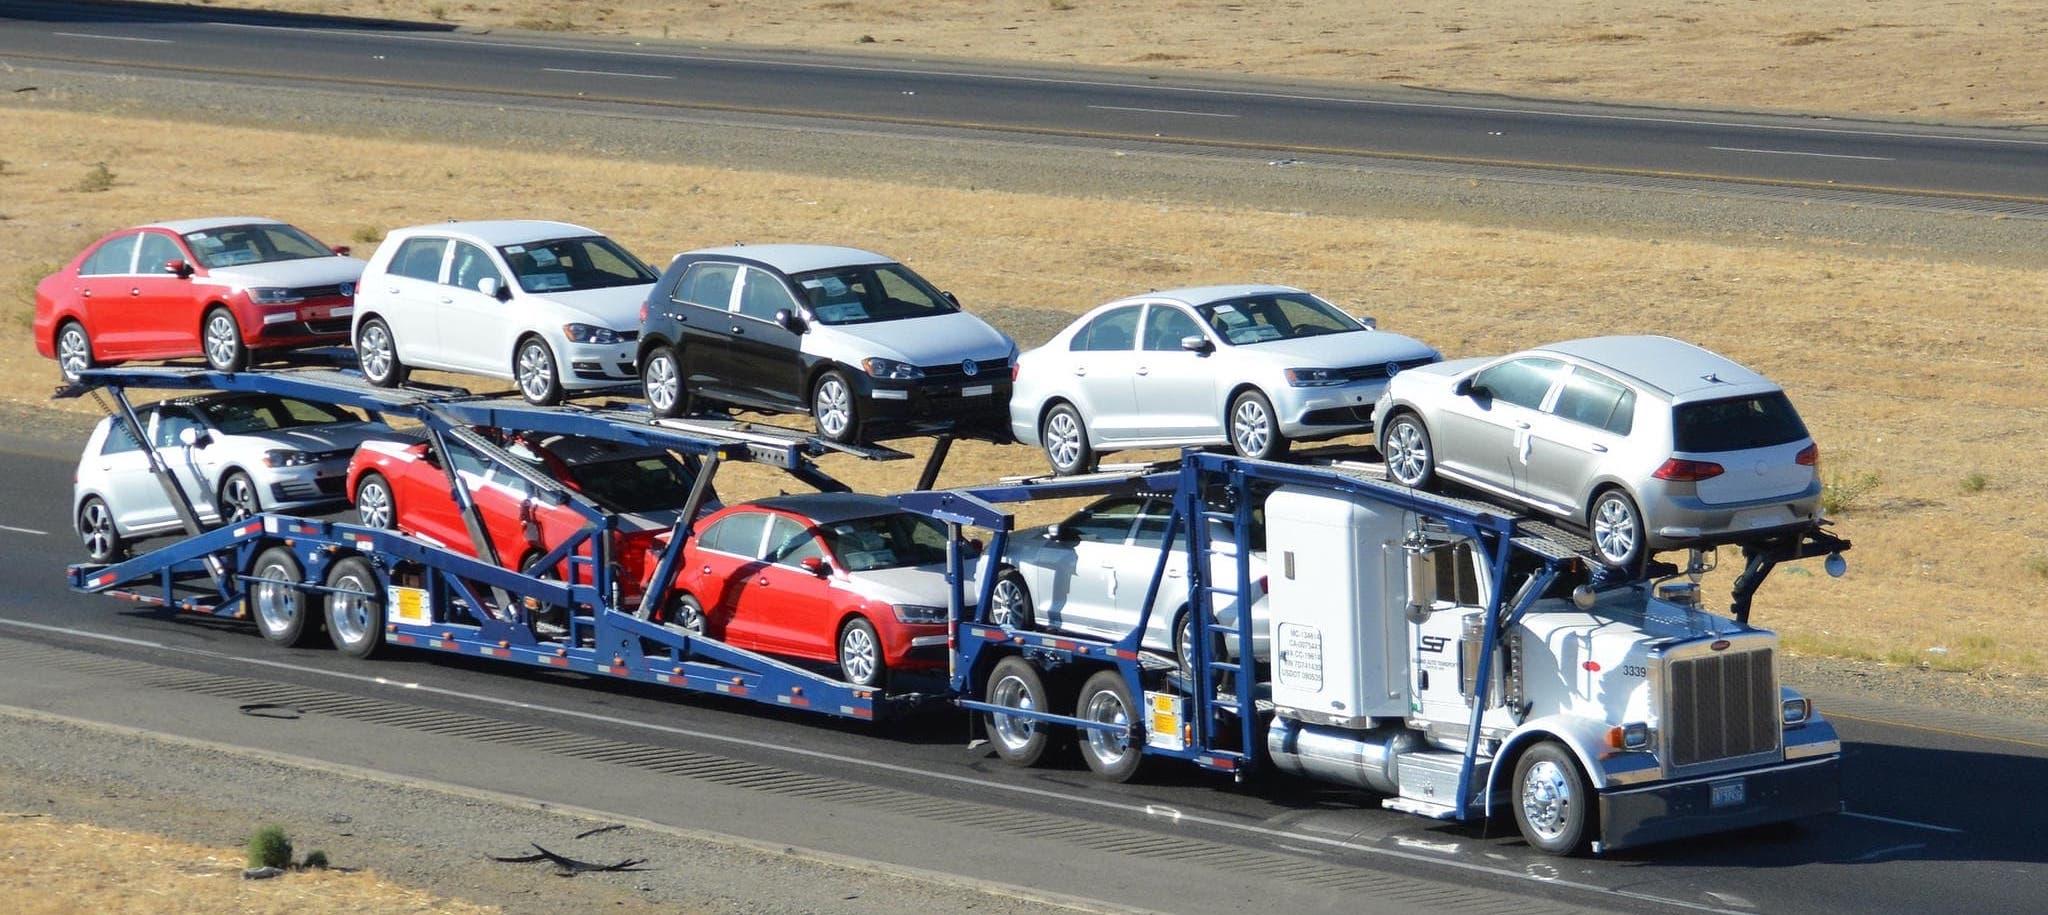 New York car shipping on a car hauler